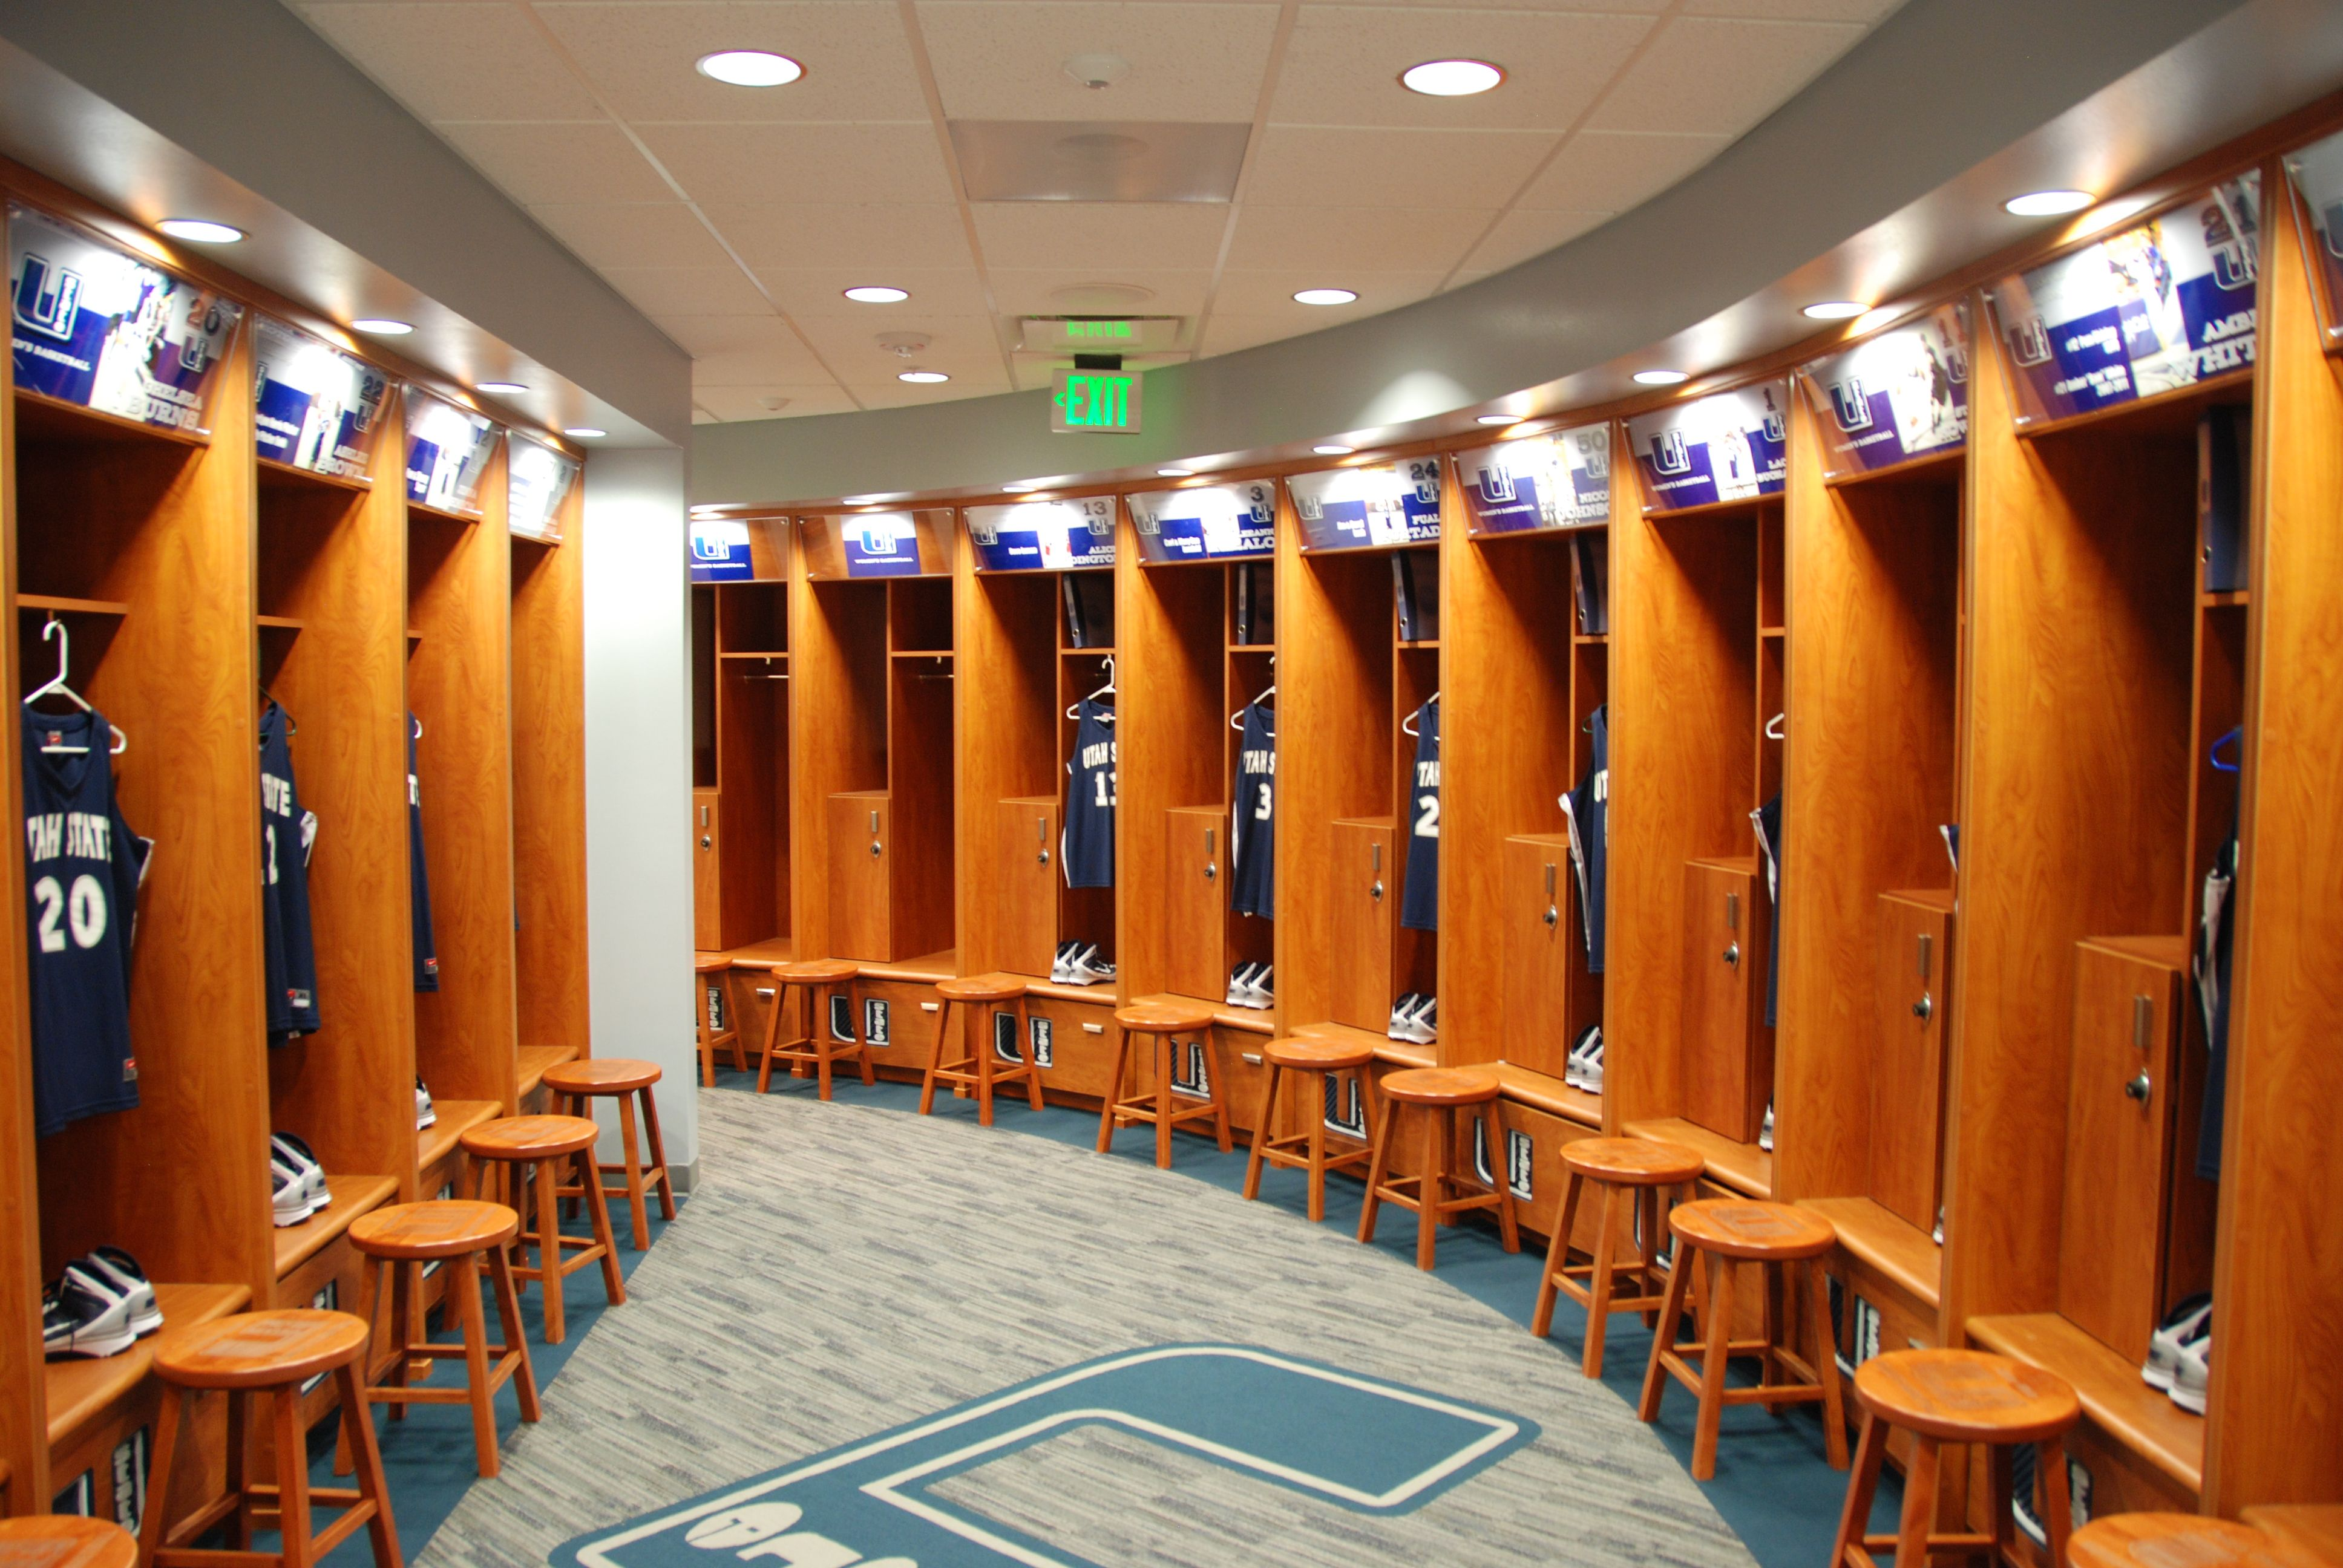 Utah State University Women S Basketball Locker Room Volleyball Room Locker Room Indoor Gym